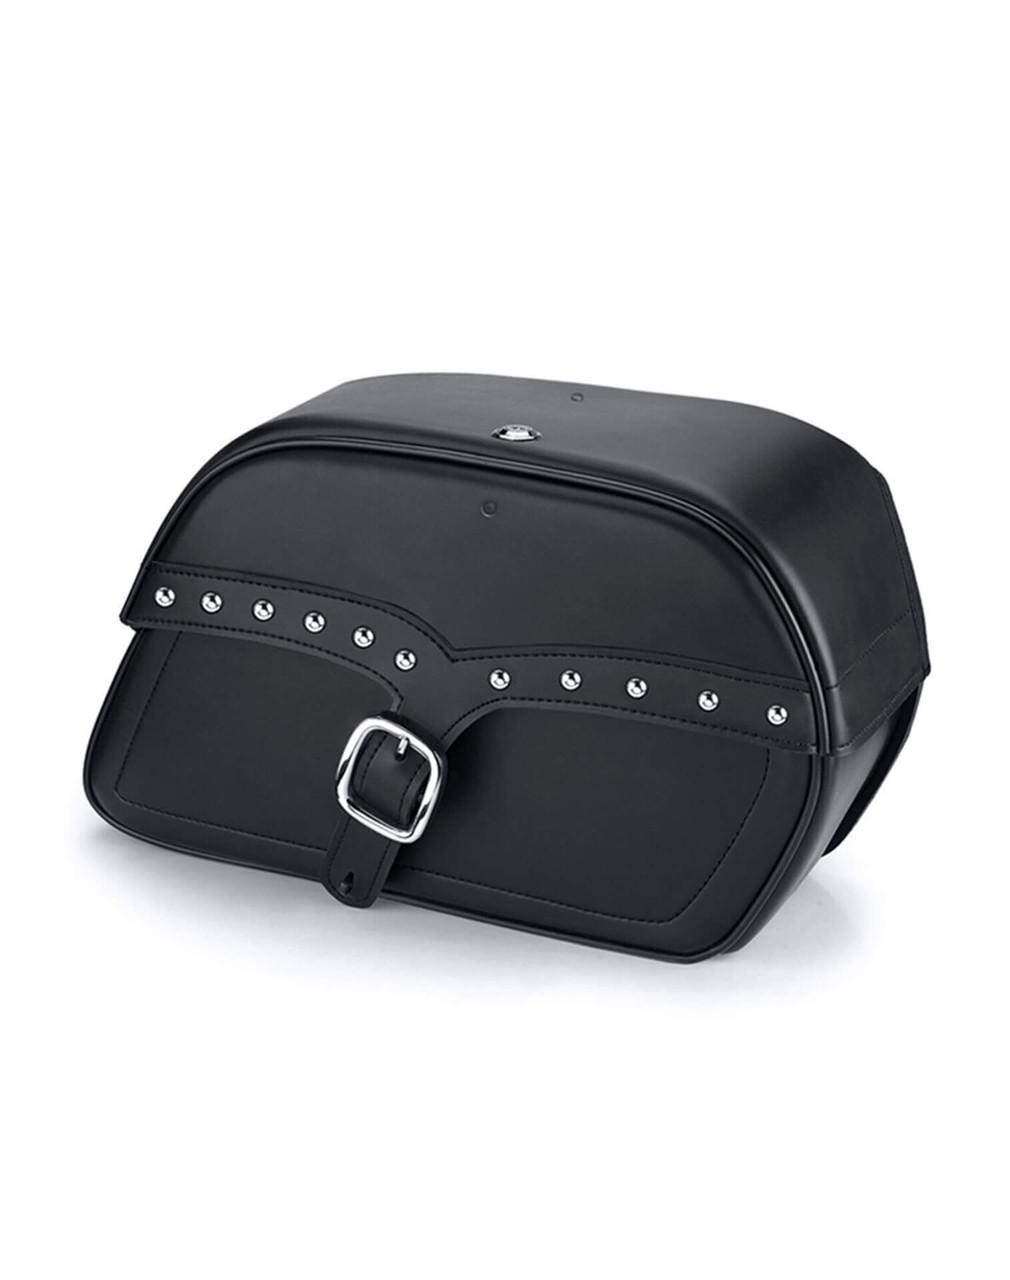 Honda 1500 Valkyrie Standard Charger Single Strap Studded Medium Motorcycle Saddlebags Main Bag View